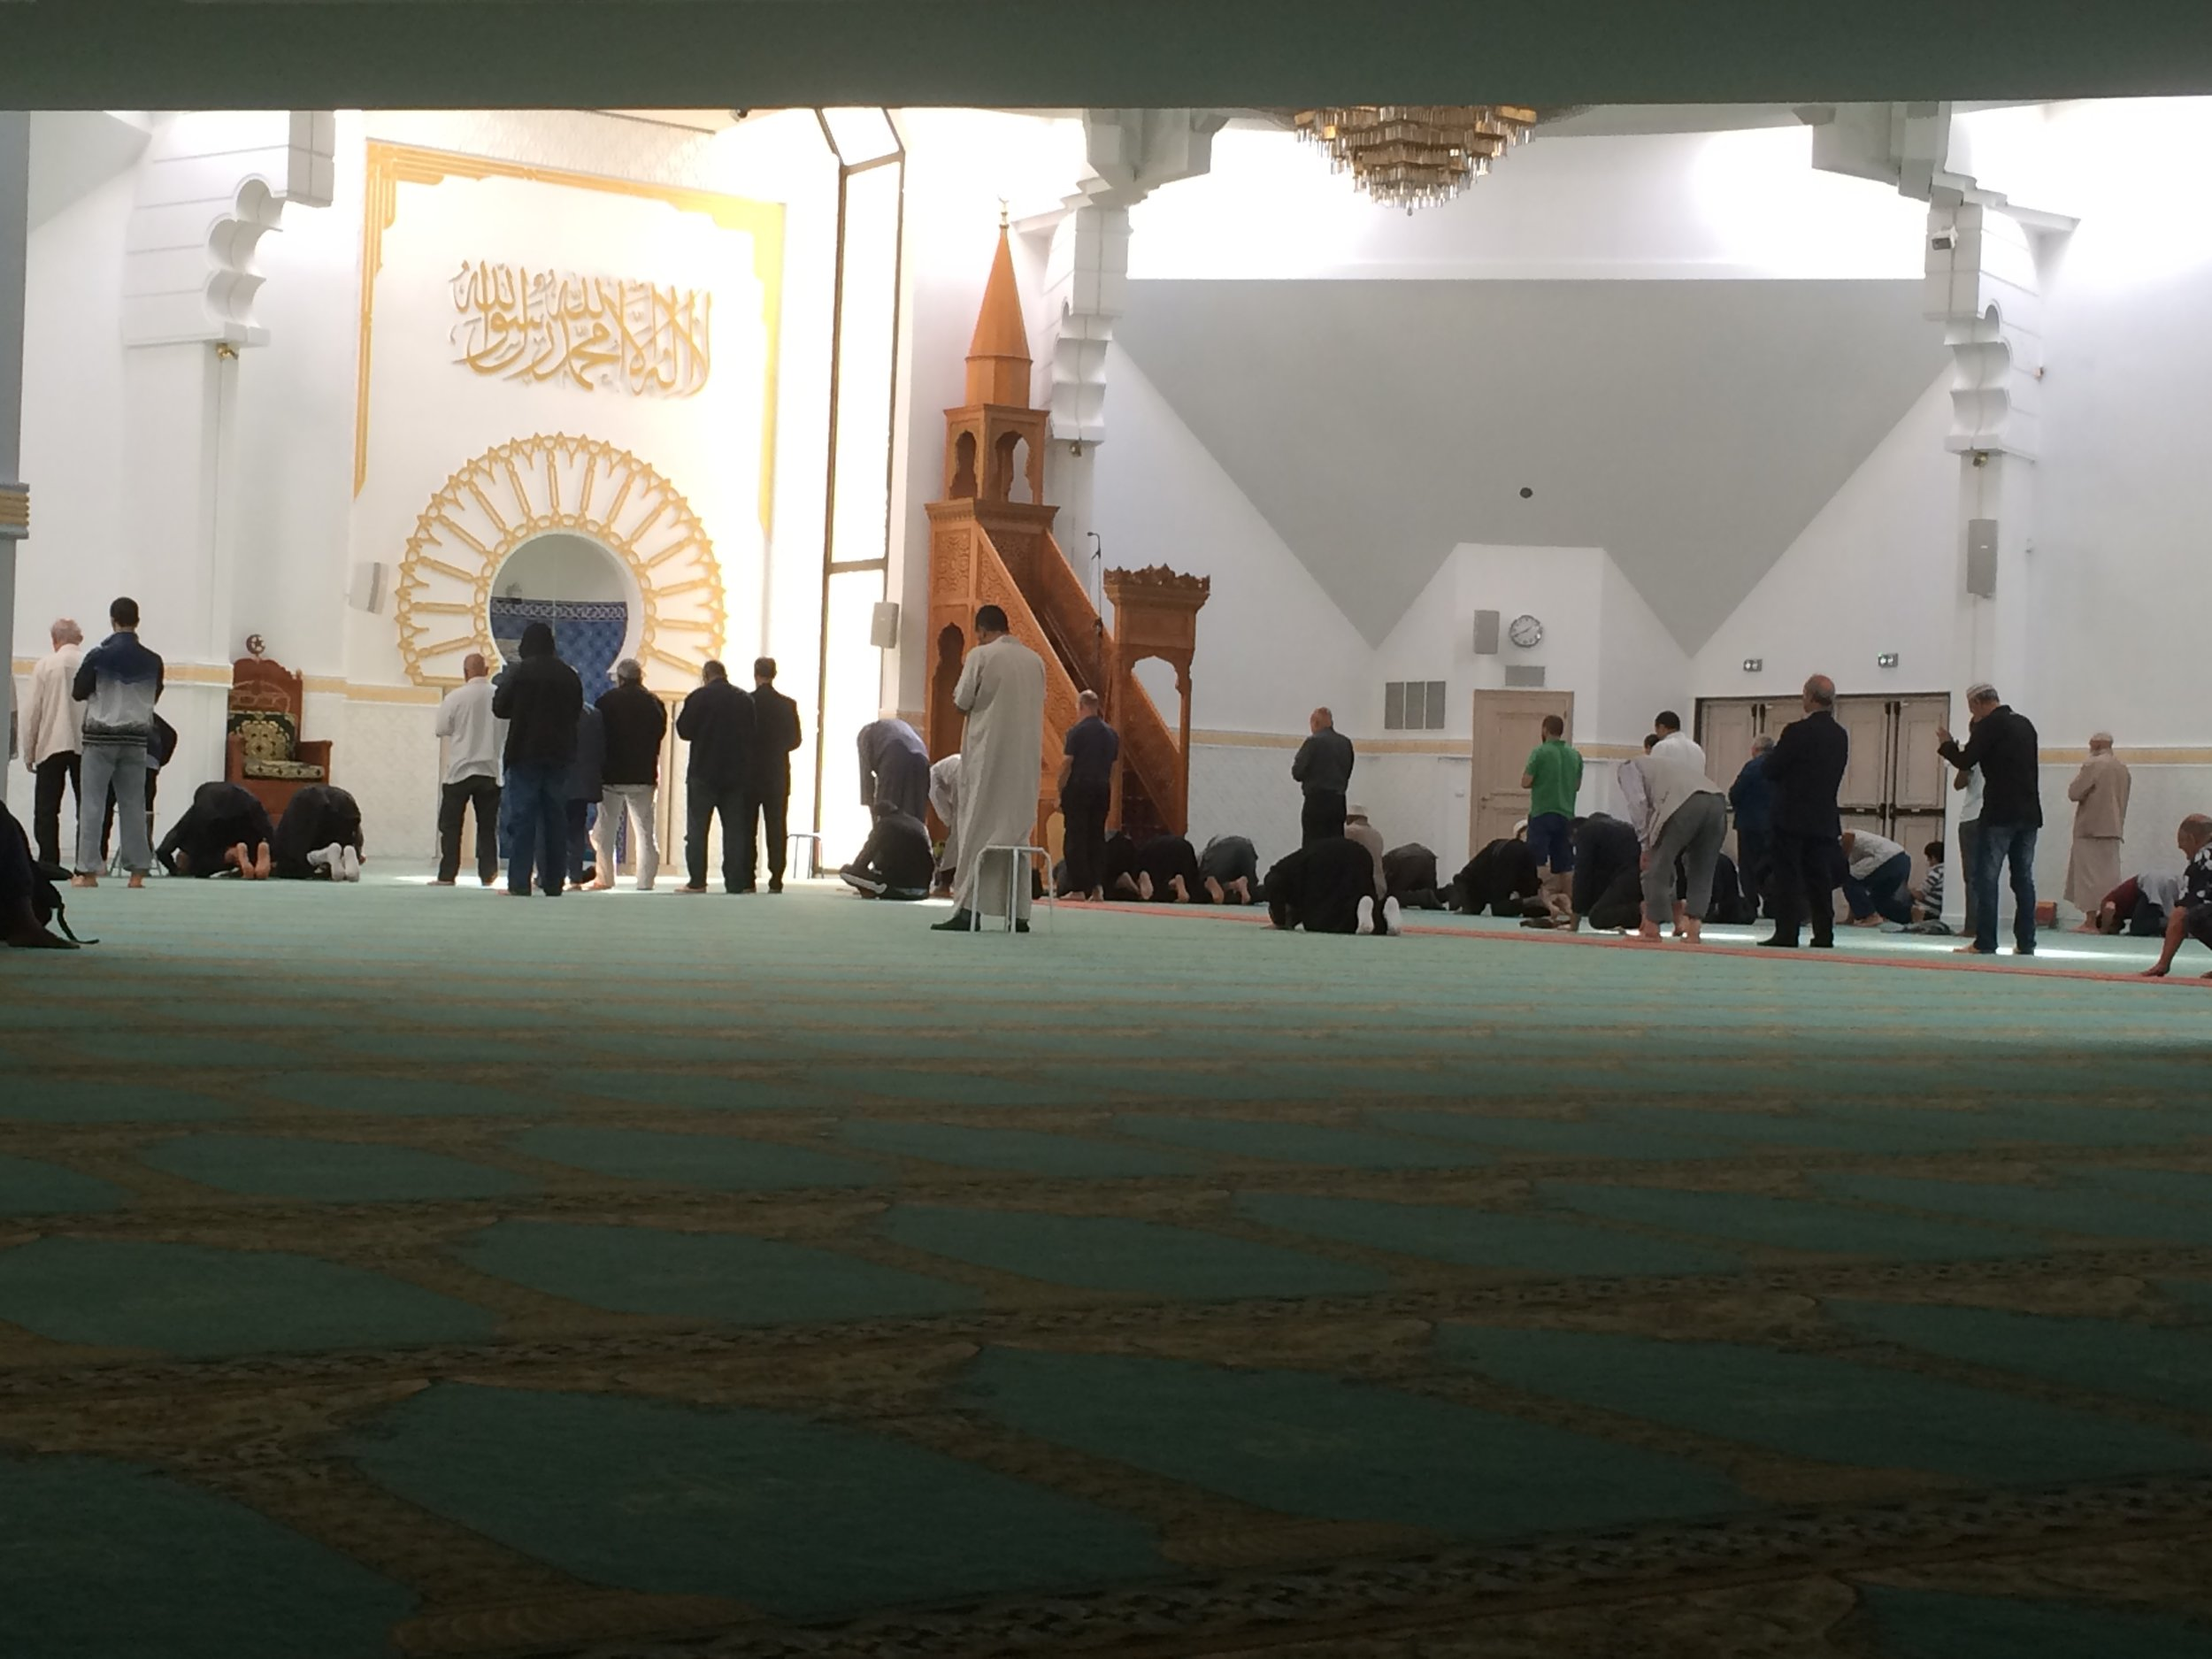 mosque - researcher_s photo (2).jpg